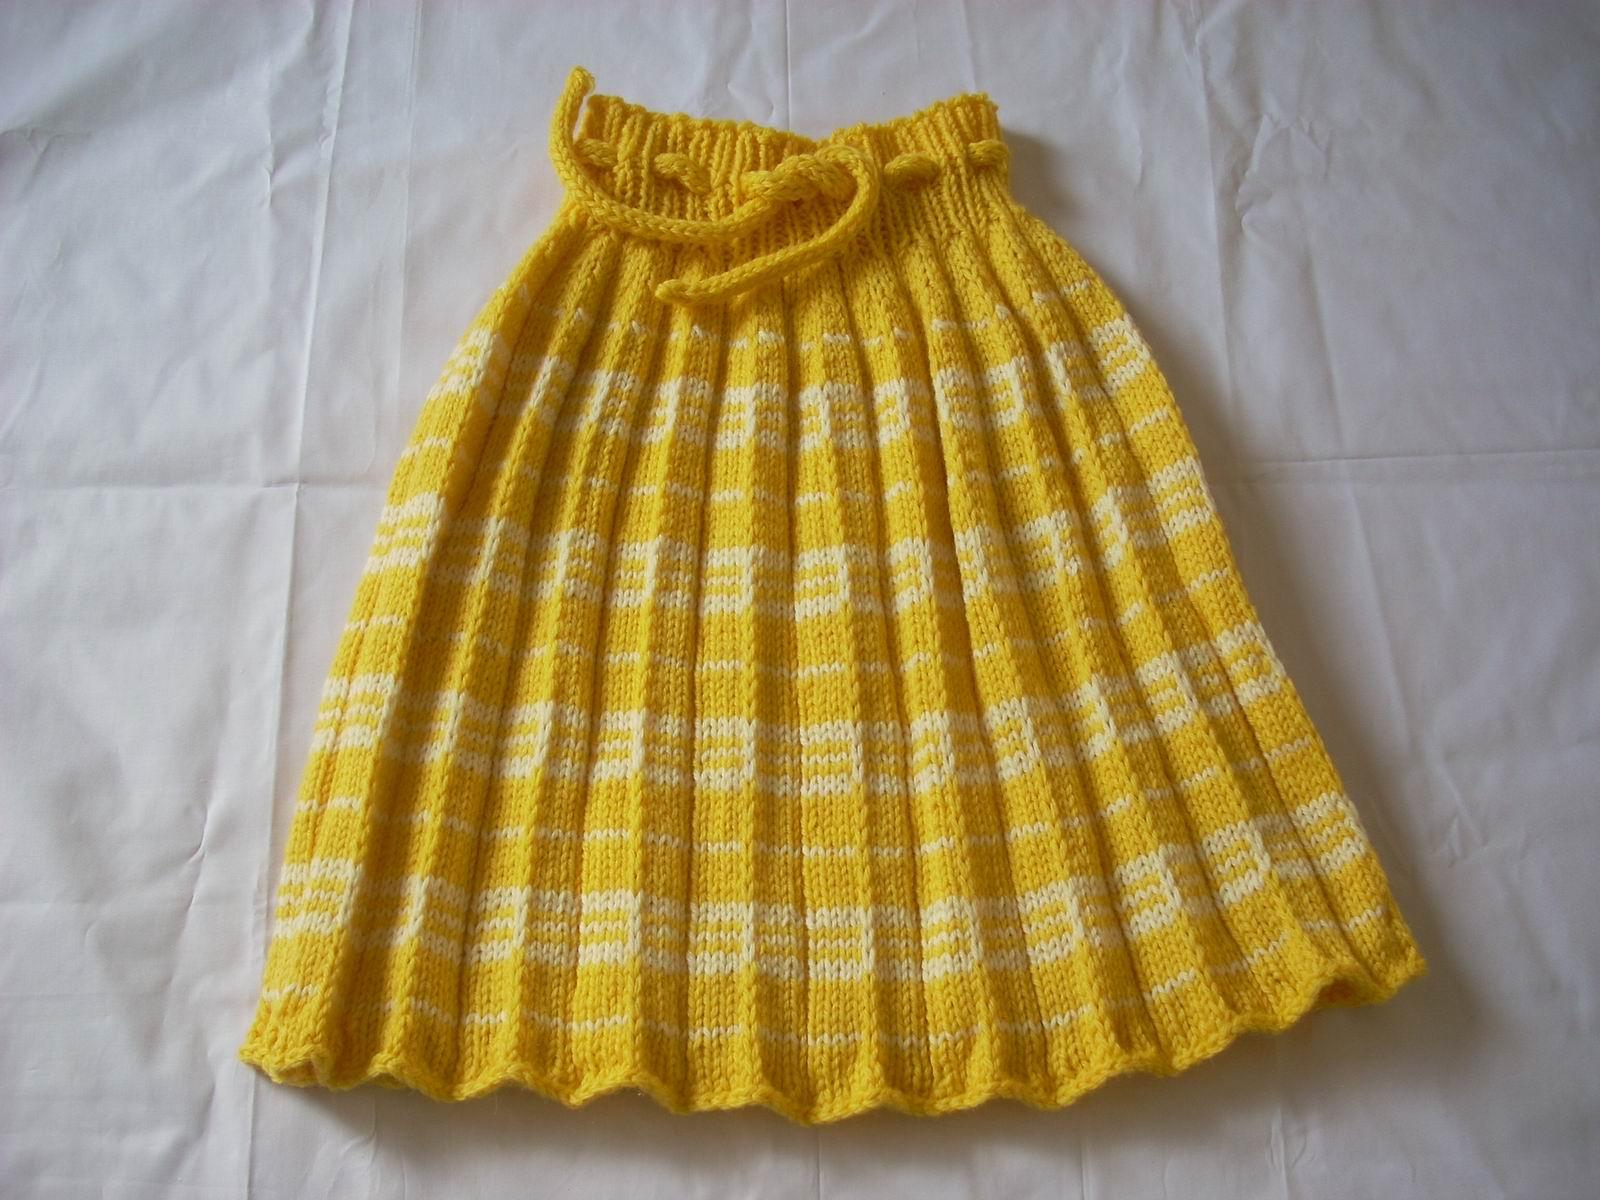 Umme yusuf swish pleated skirt swish pleated skirt bankloansurffo Images